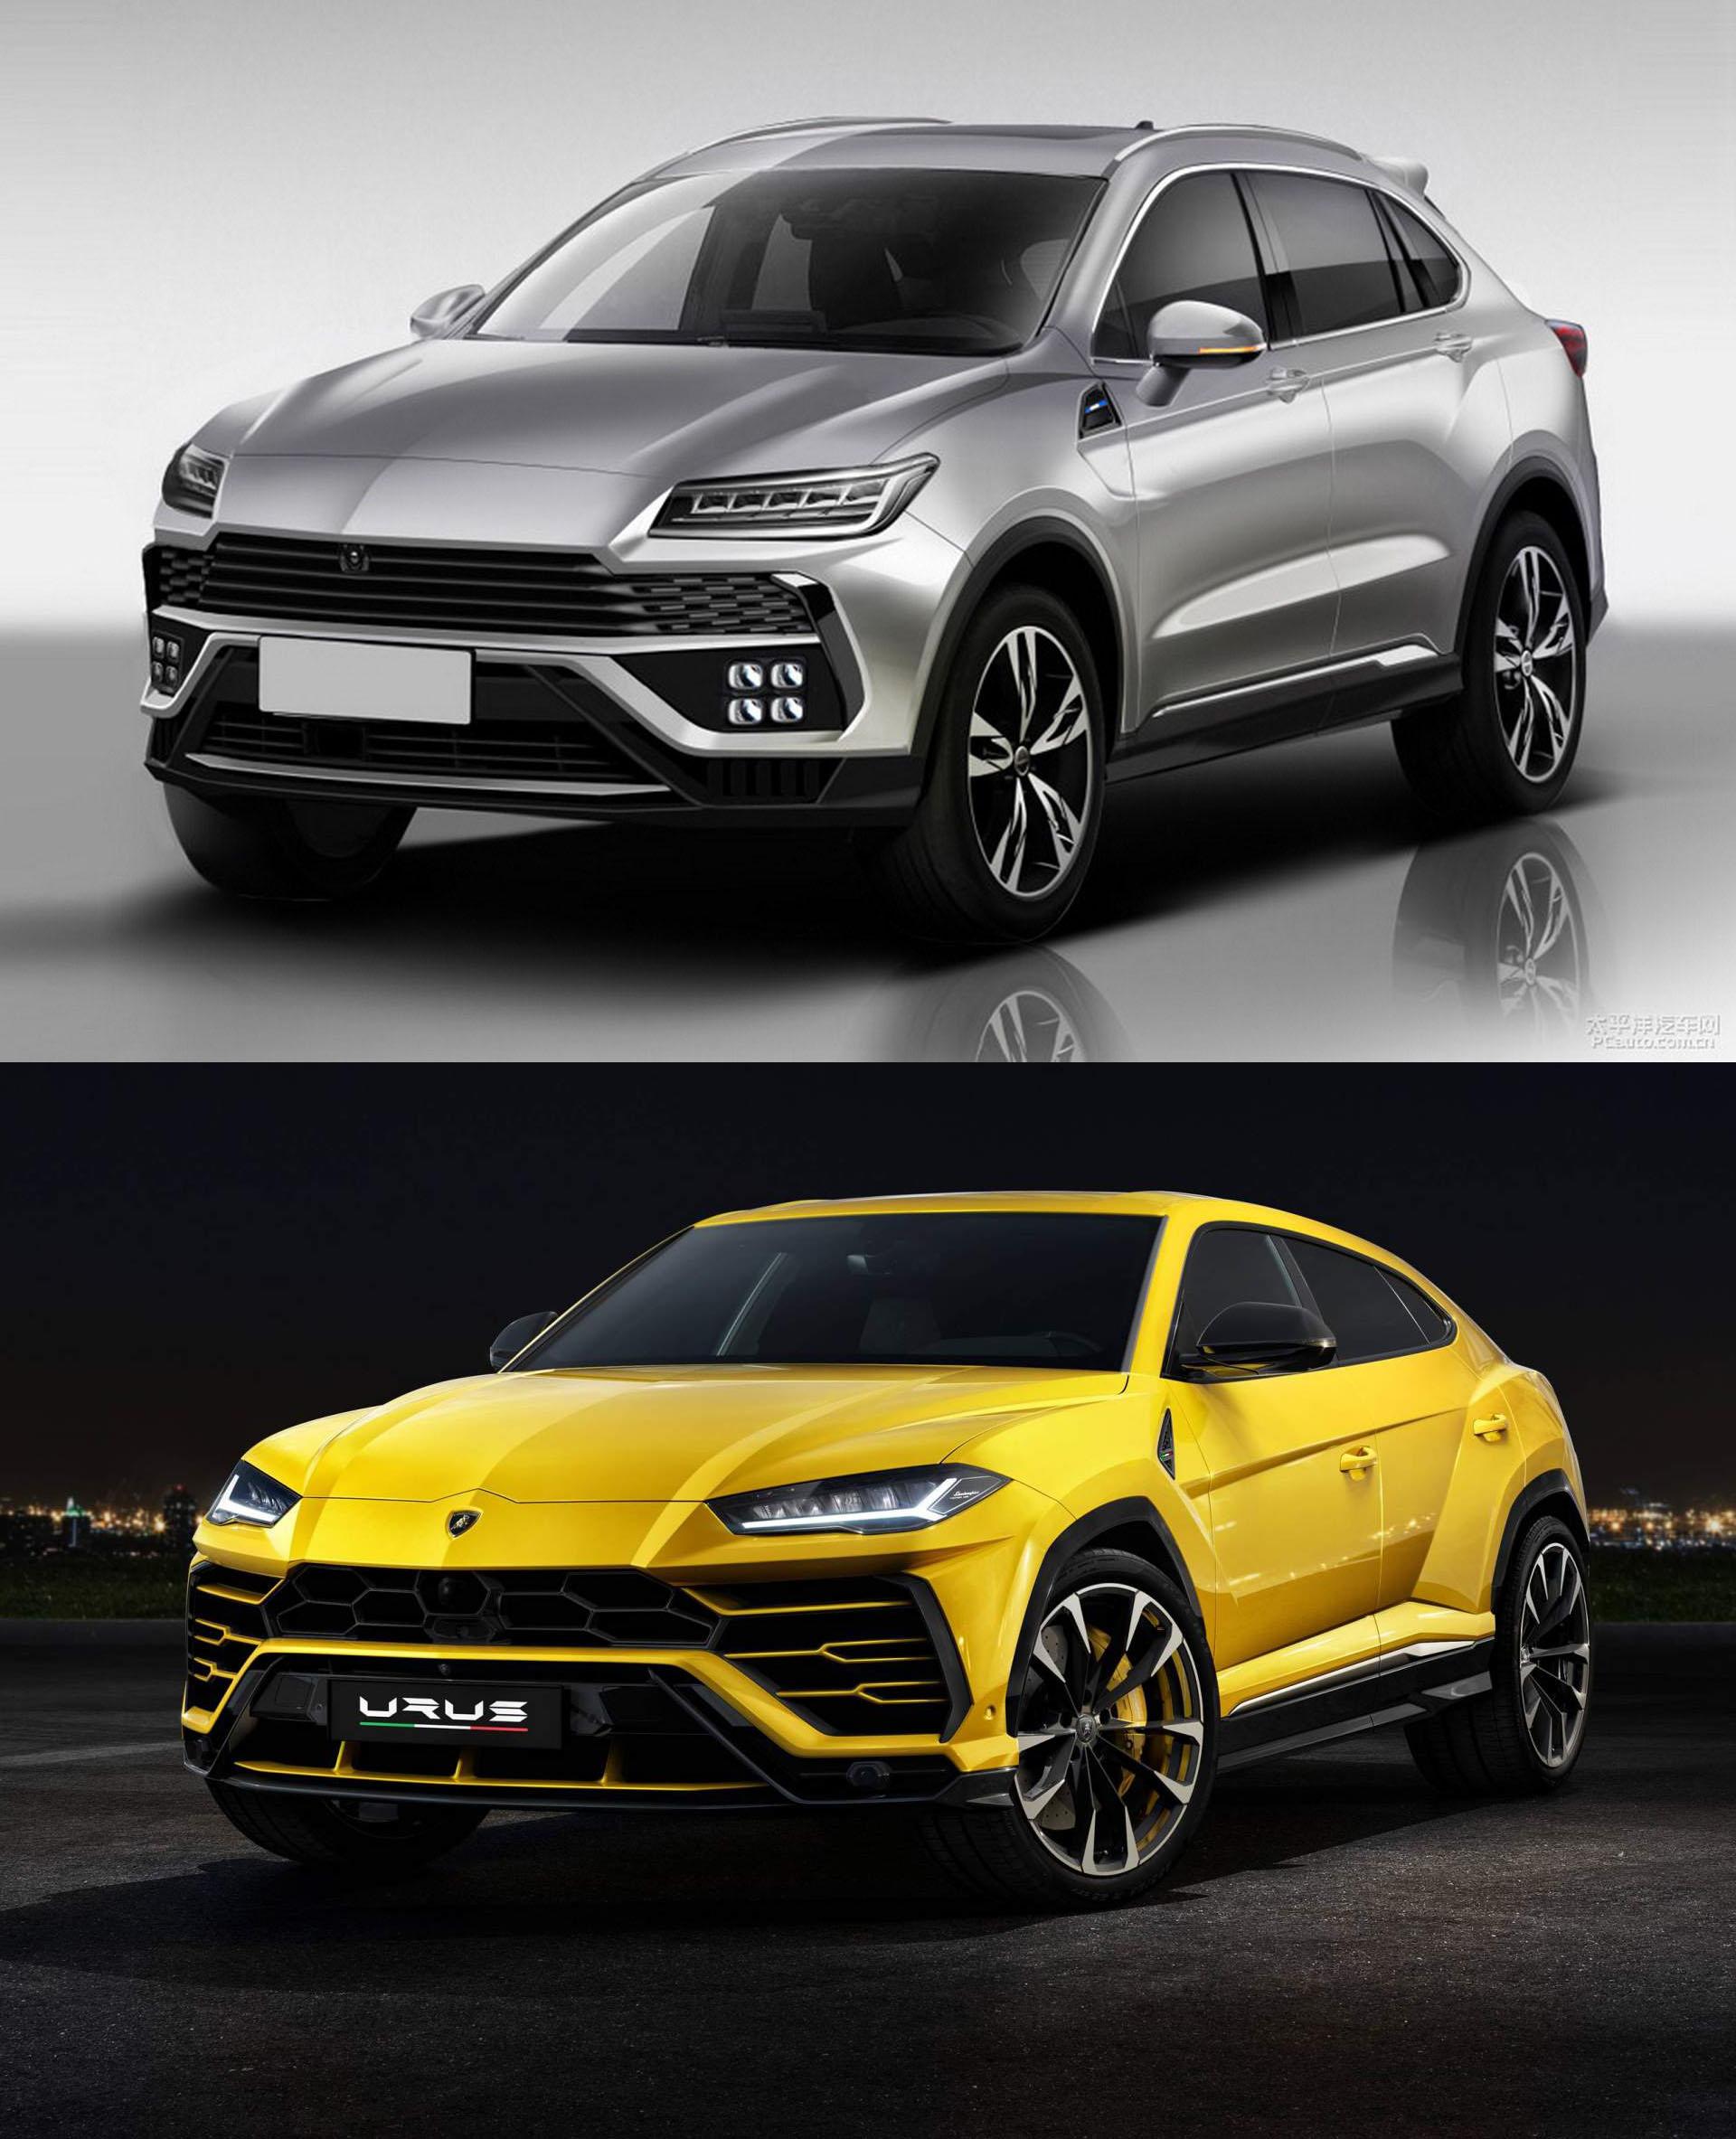 Lamborghini Urus e Huansu Hyosow C60 2018